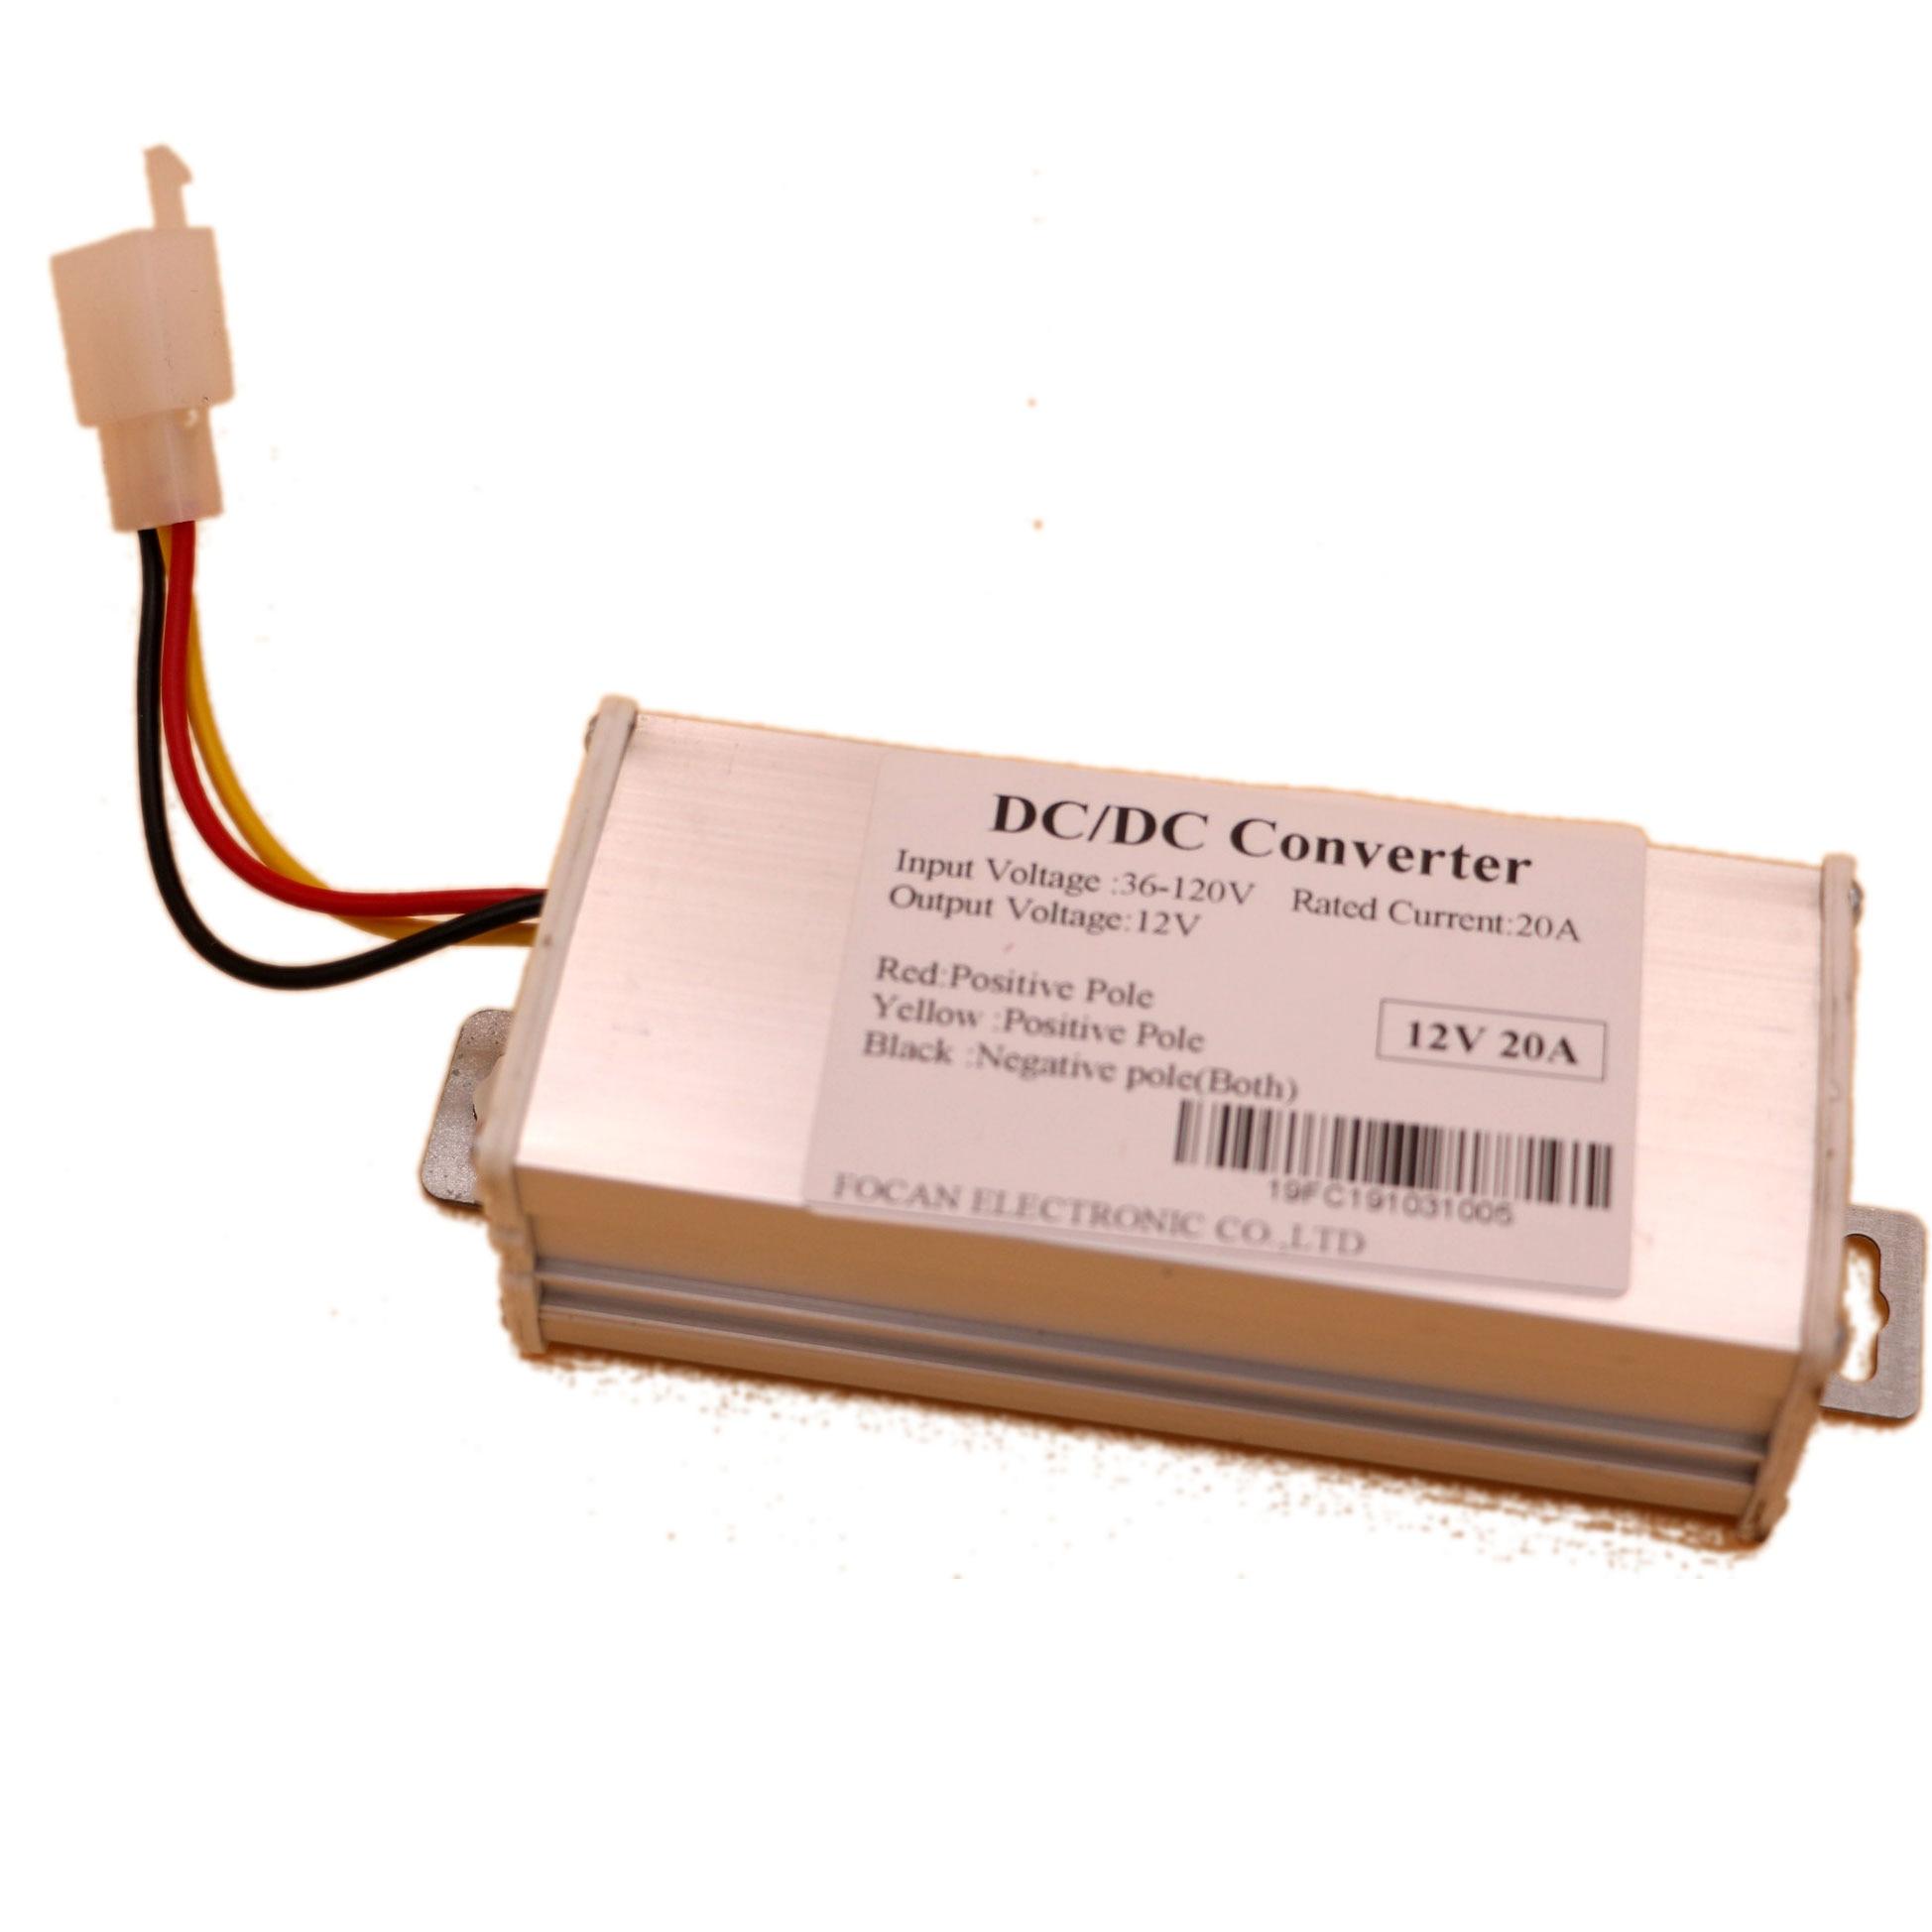 36V/48V/60V/72V/80v/96V/120V To 12V 20A DC/DC Converter For Electric Car /Vehicle Battery